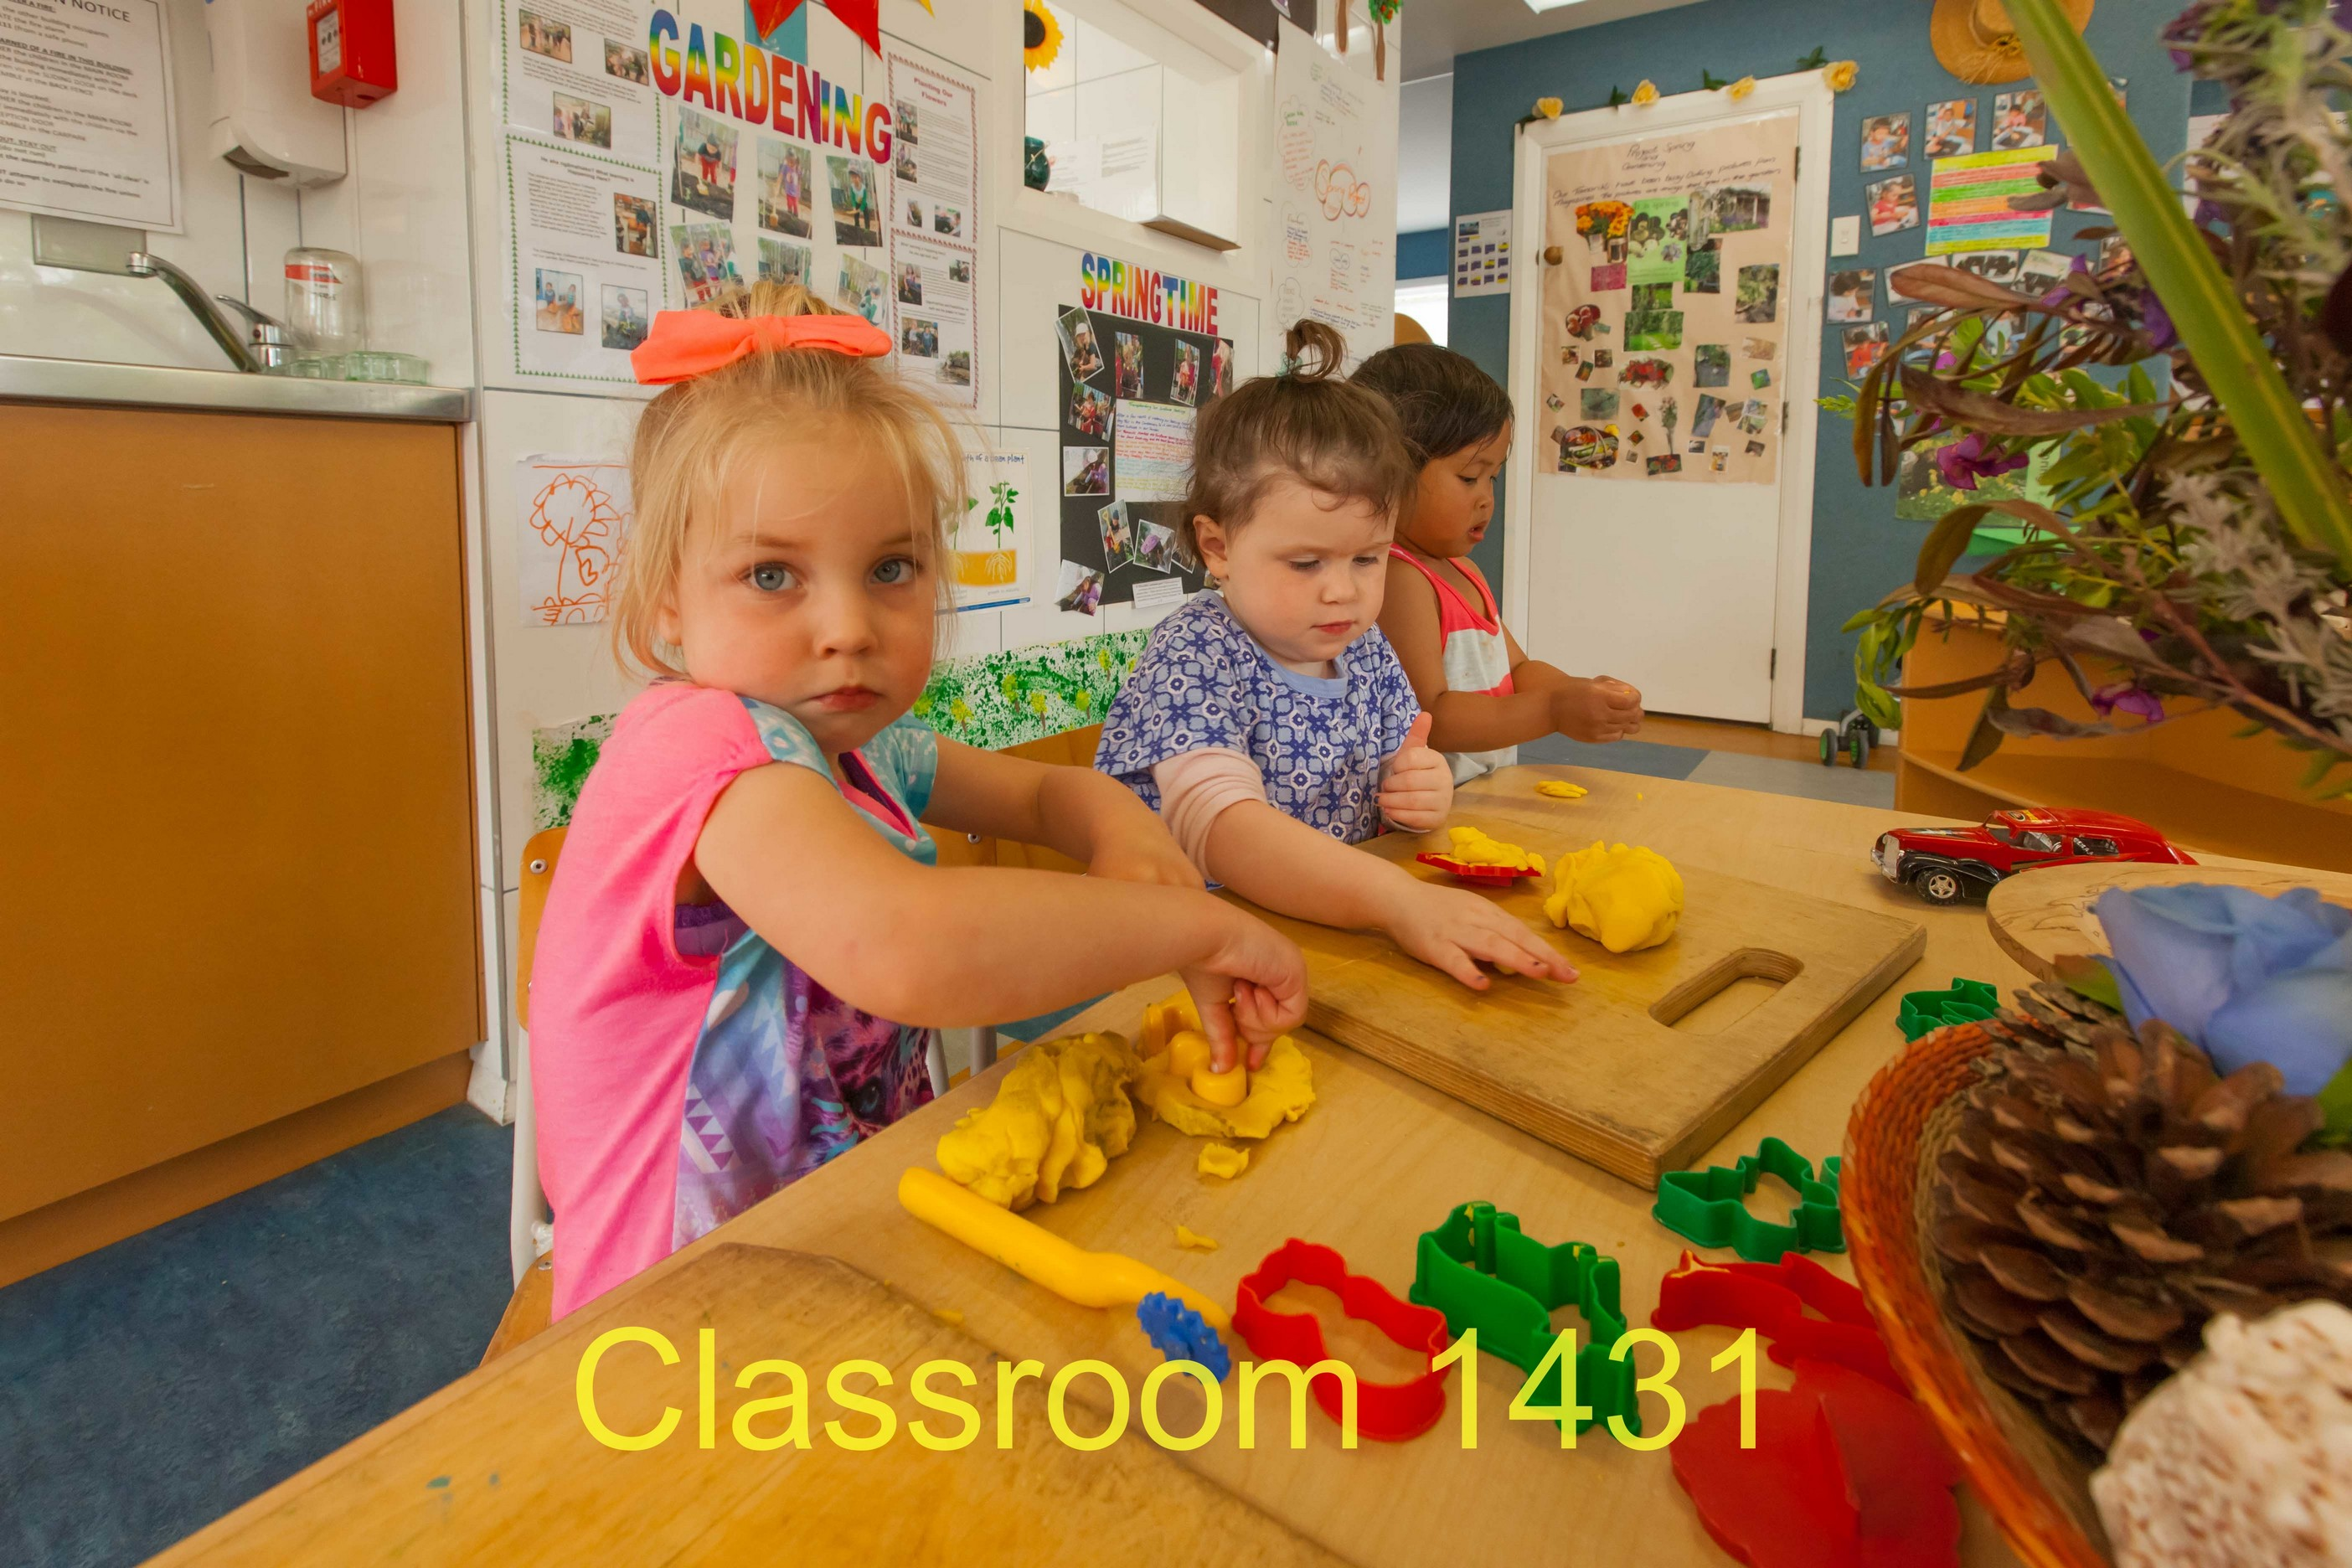 Classroom 1431